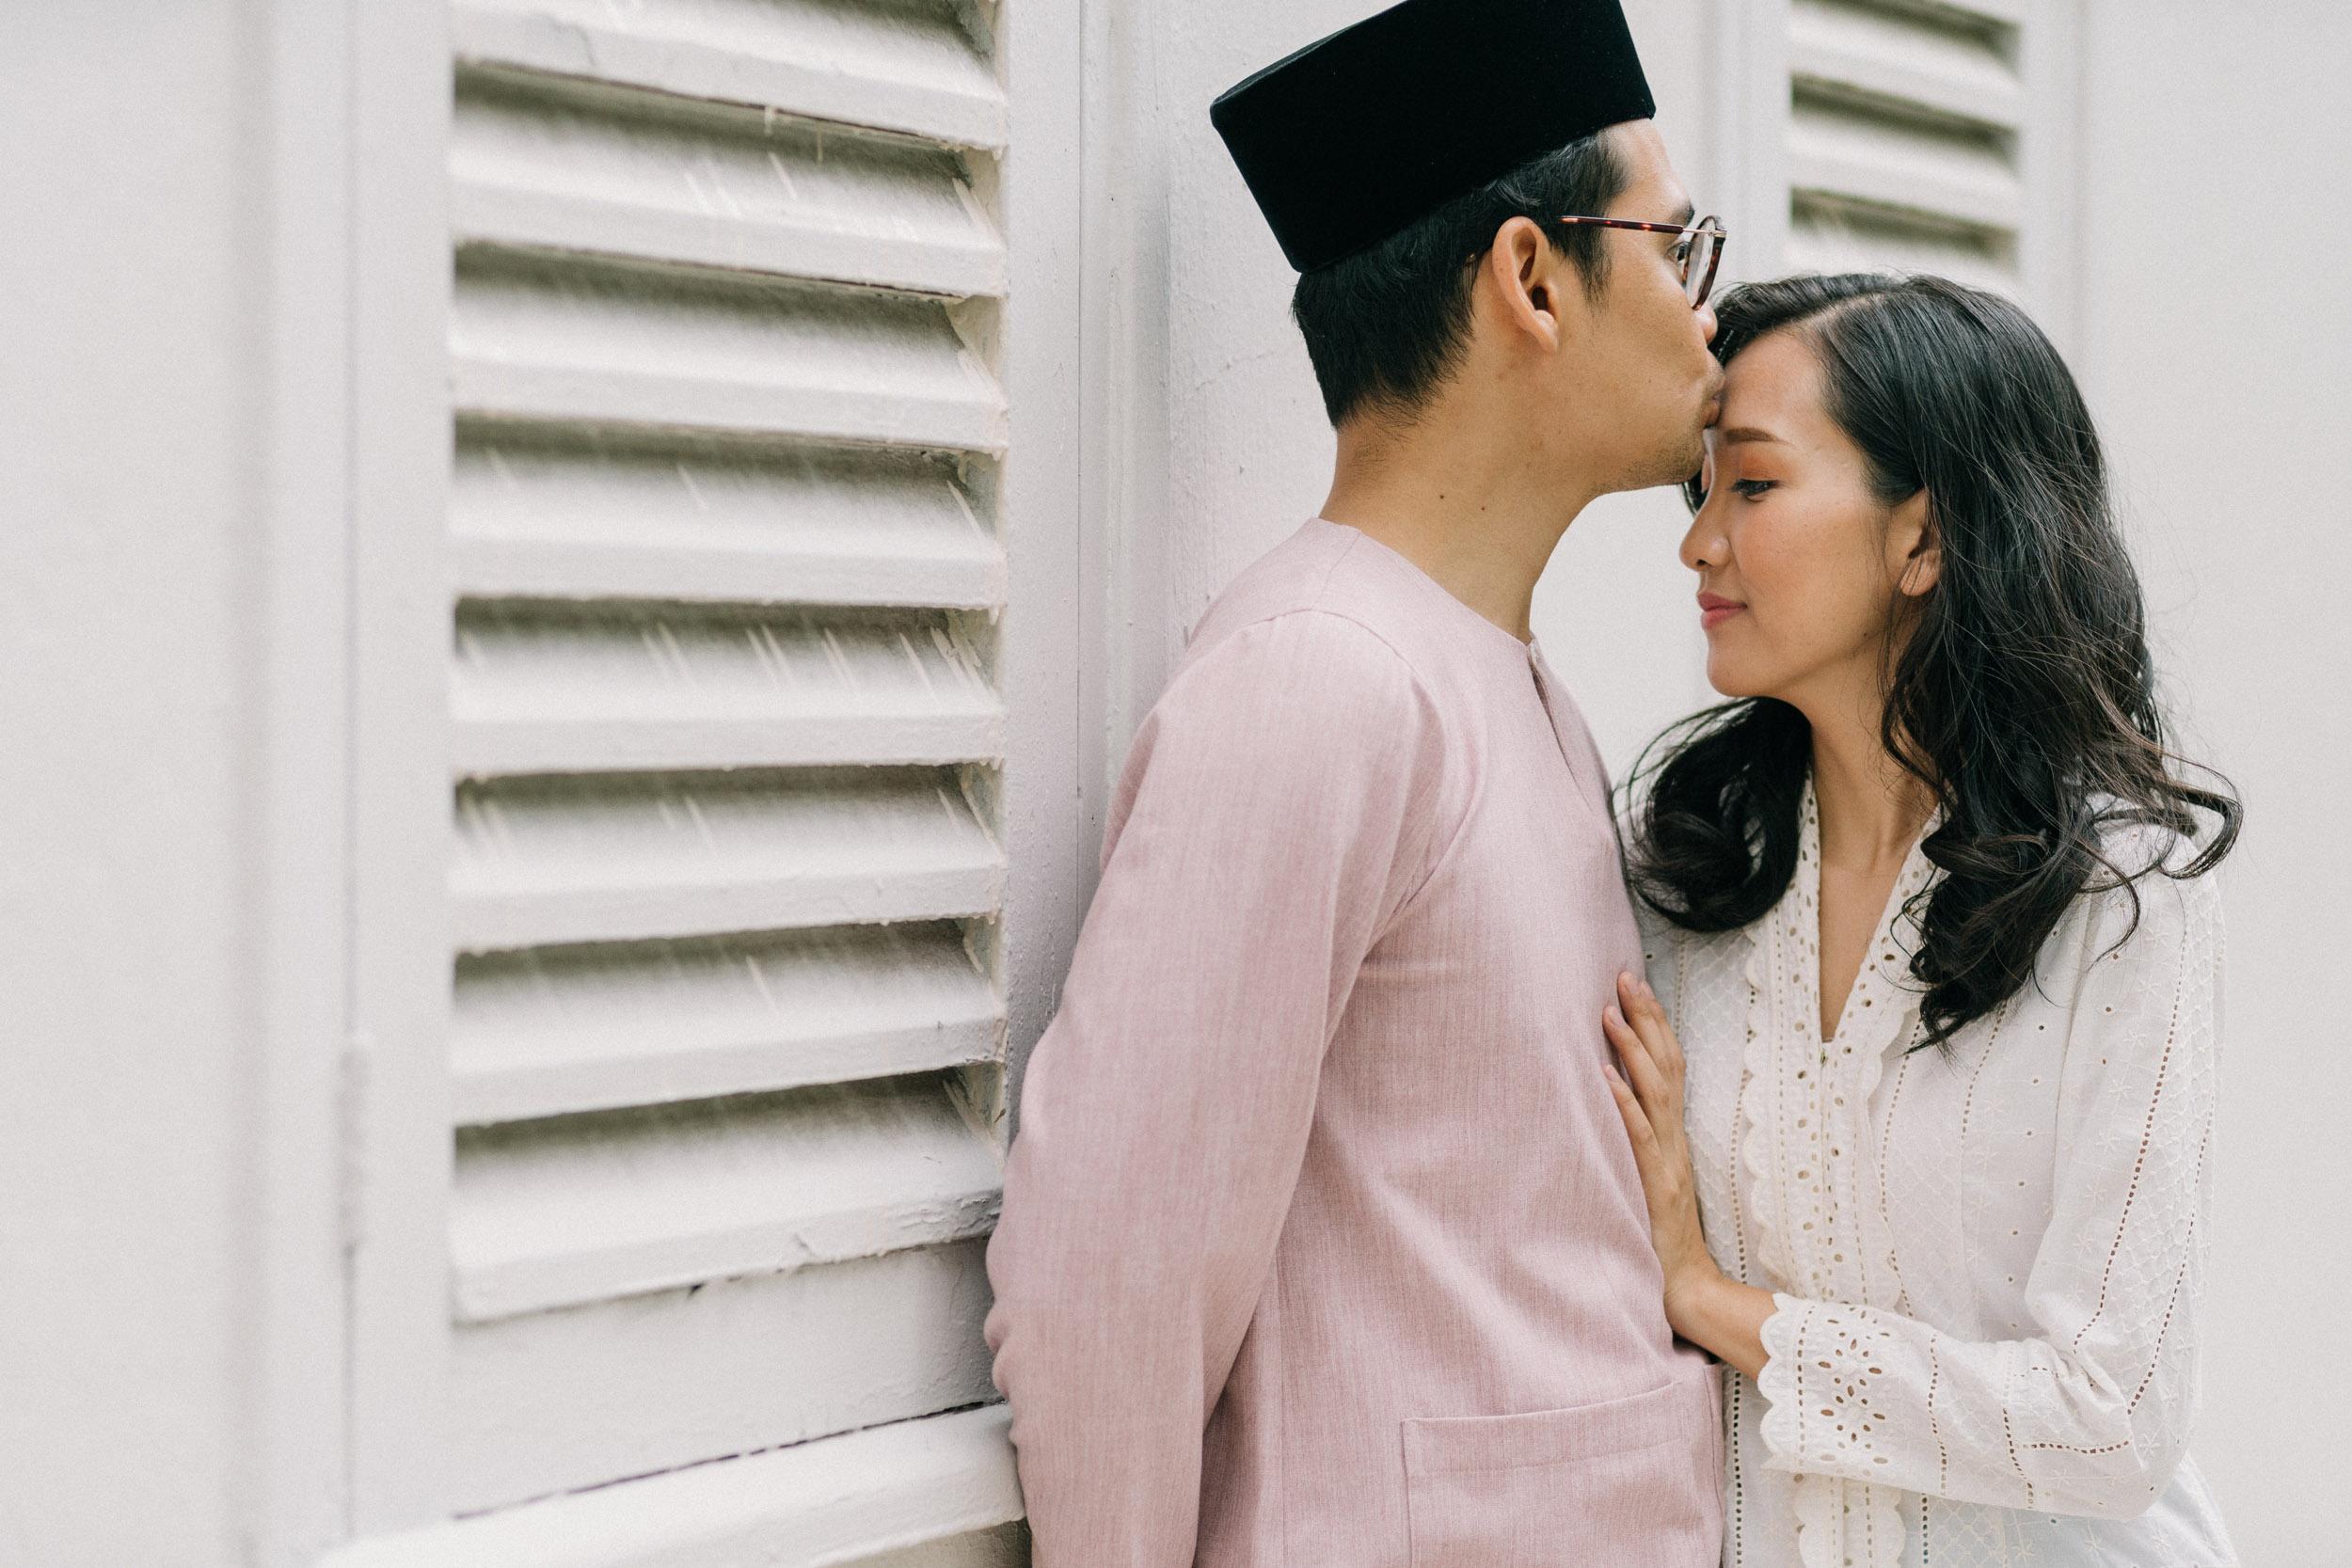 singapore-wedding-photographer-wemadethese-adib-mizah-19.jpg